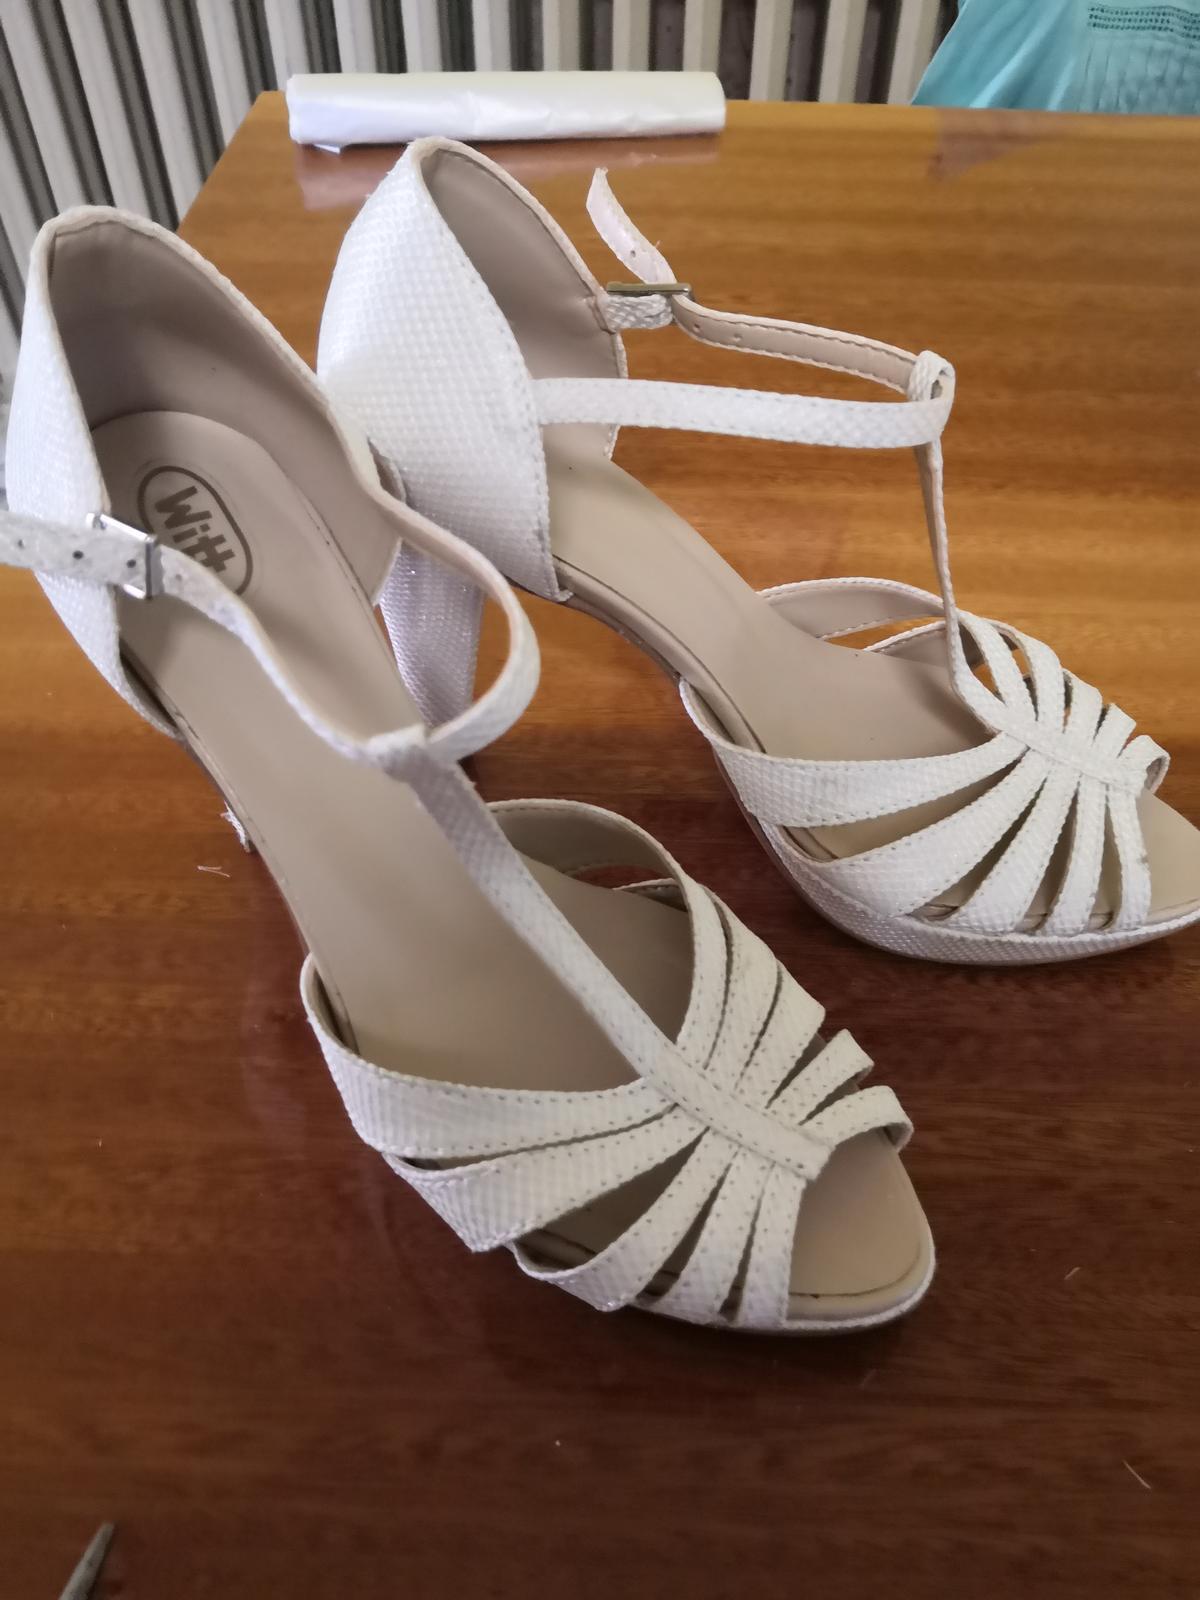 Svadobné sandálky - Obrázok č. 1